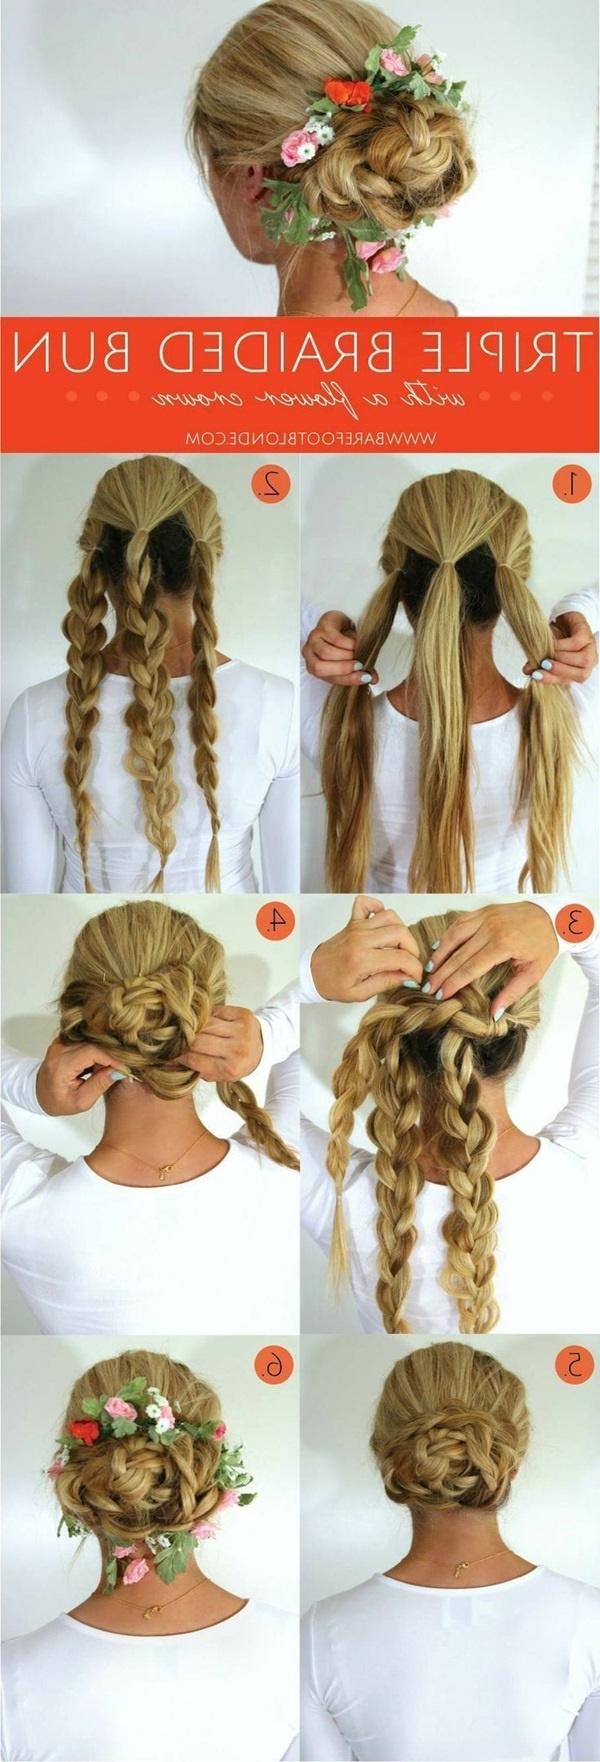 Fashionable Braided Bun Hairstyles With Puffy Crown Regarding 101 Cute & Easy Bun Hairstyles For Long Hair And Medium Hair (View 8 of 20)